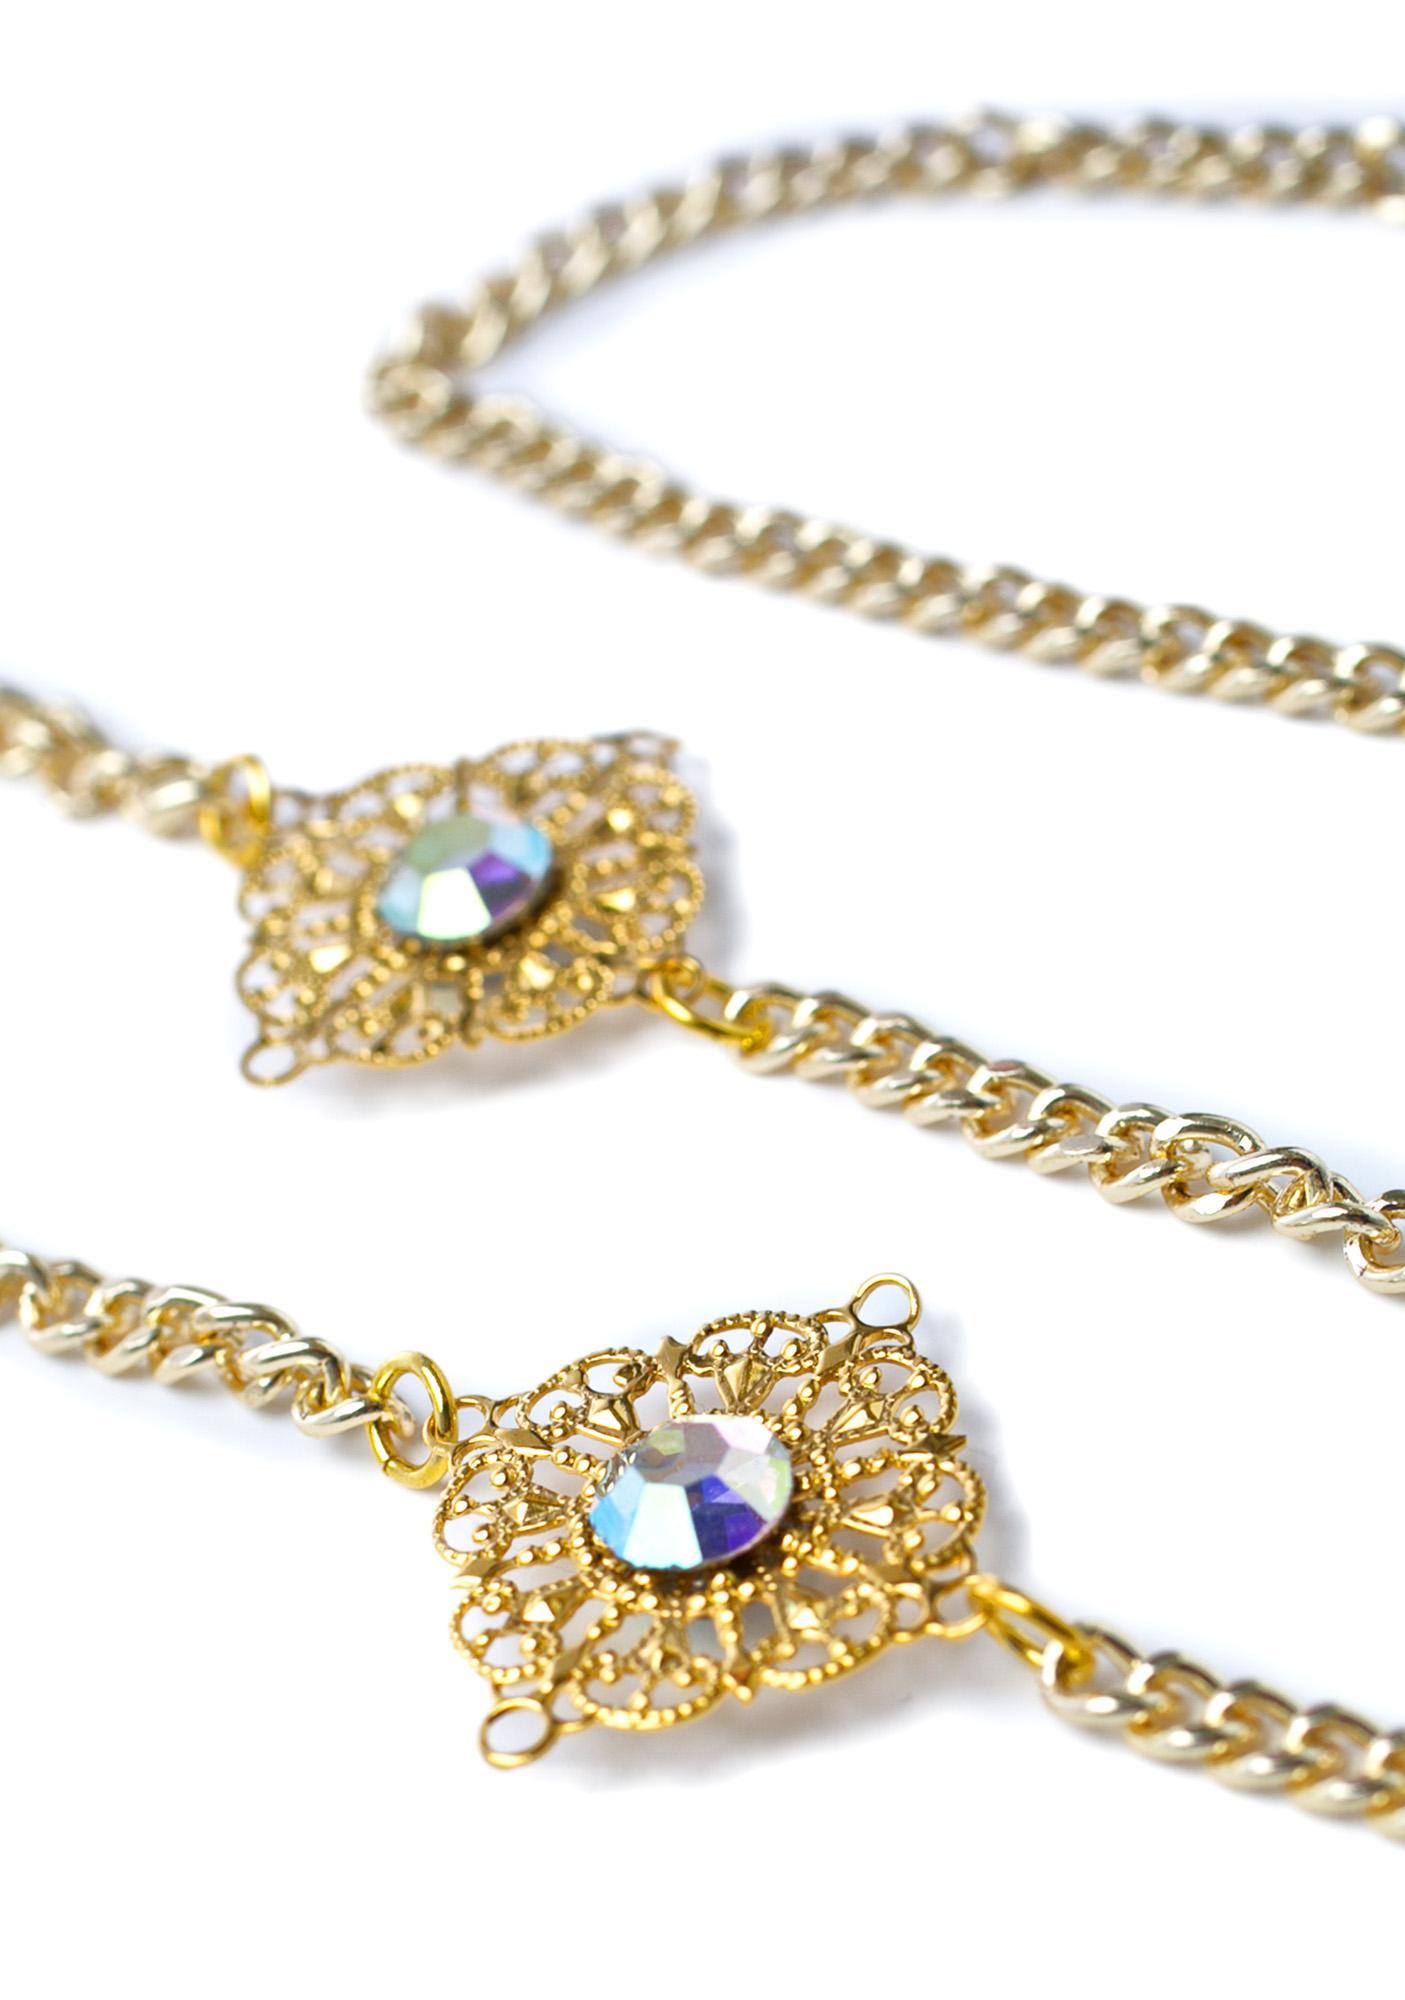 Vidakush Aurora Borealis Sunglass Chain